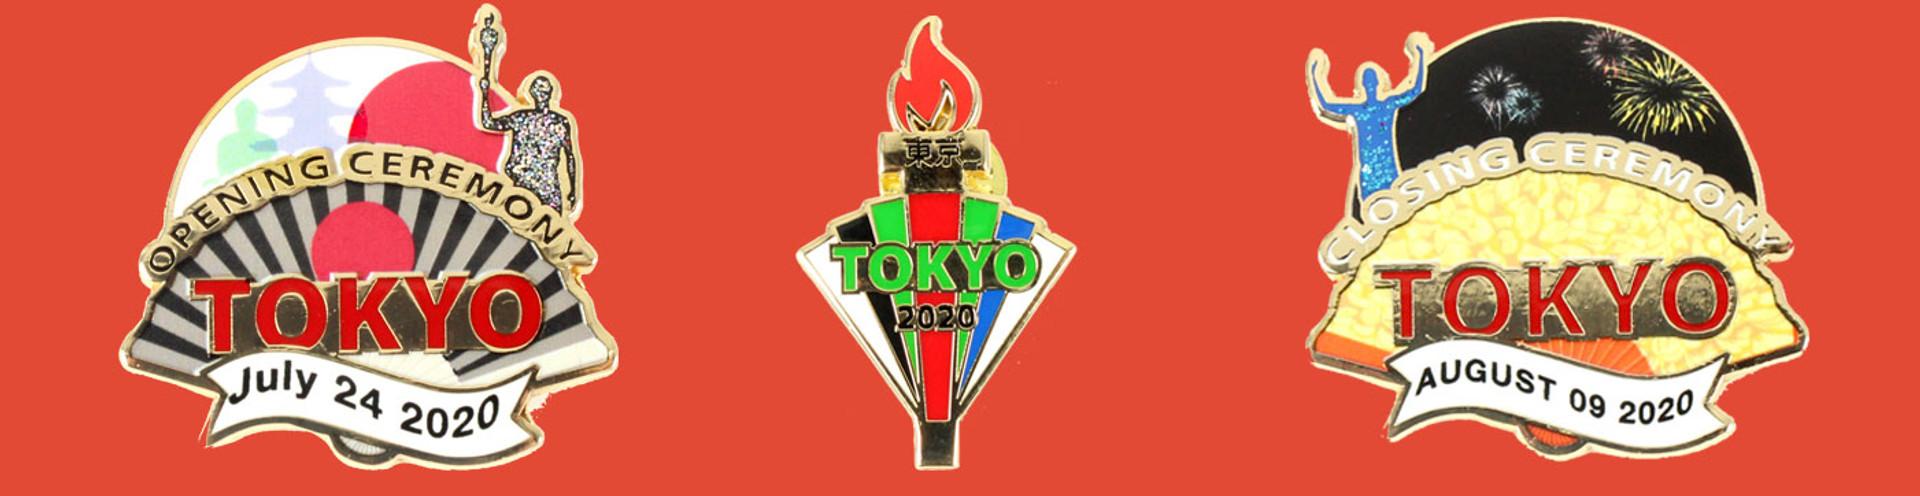 Tokyo Olympic Pins 2020